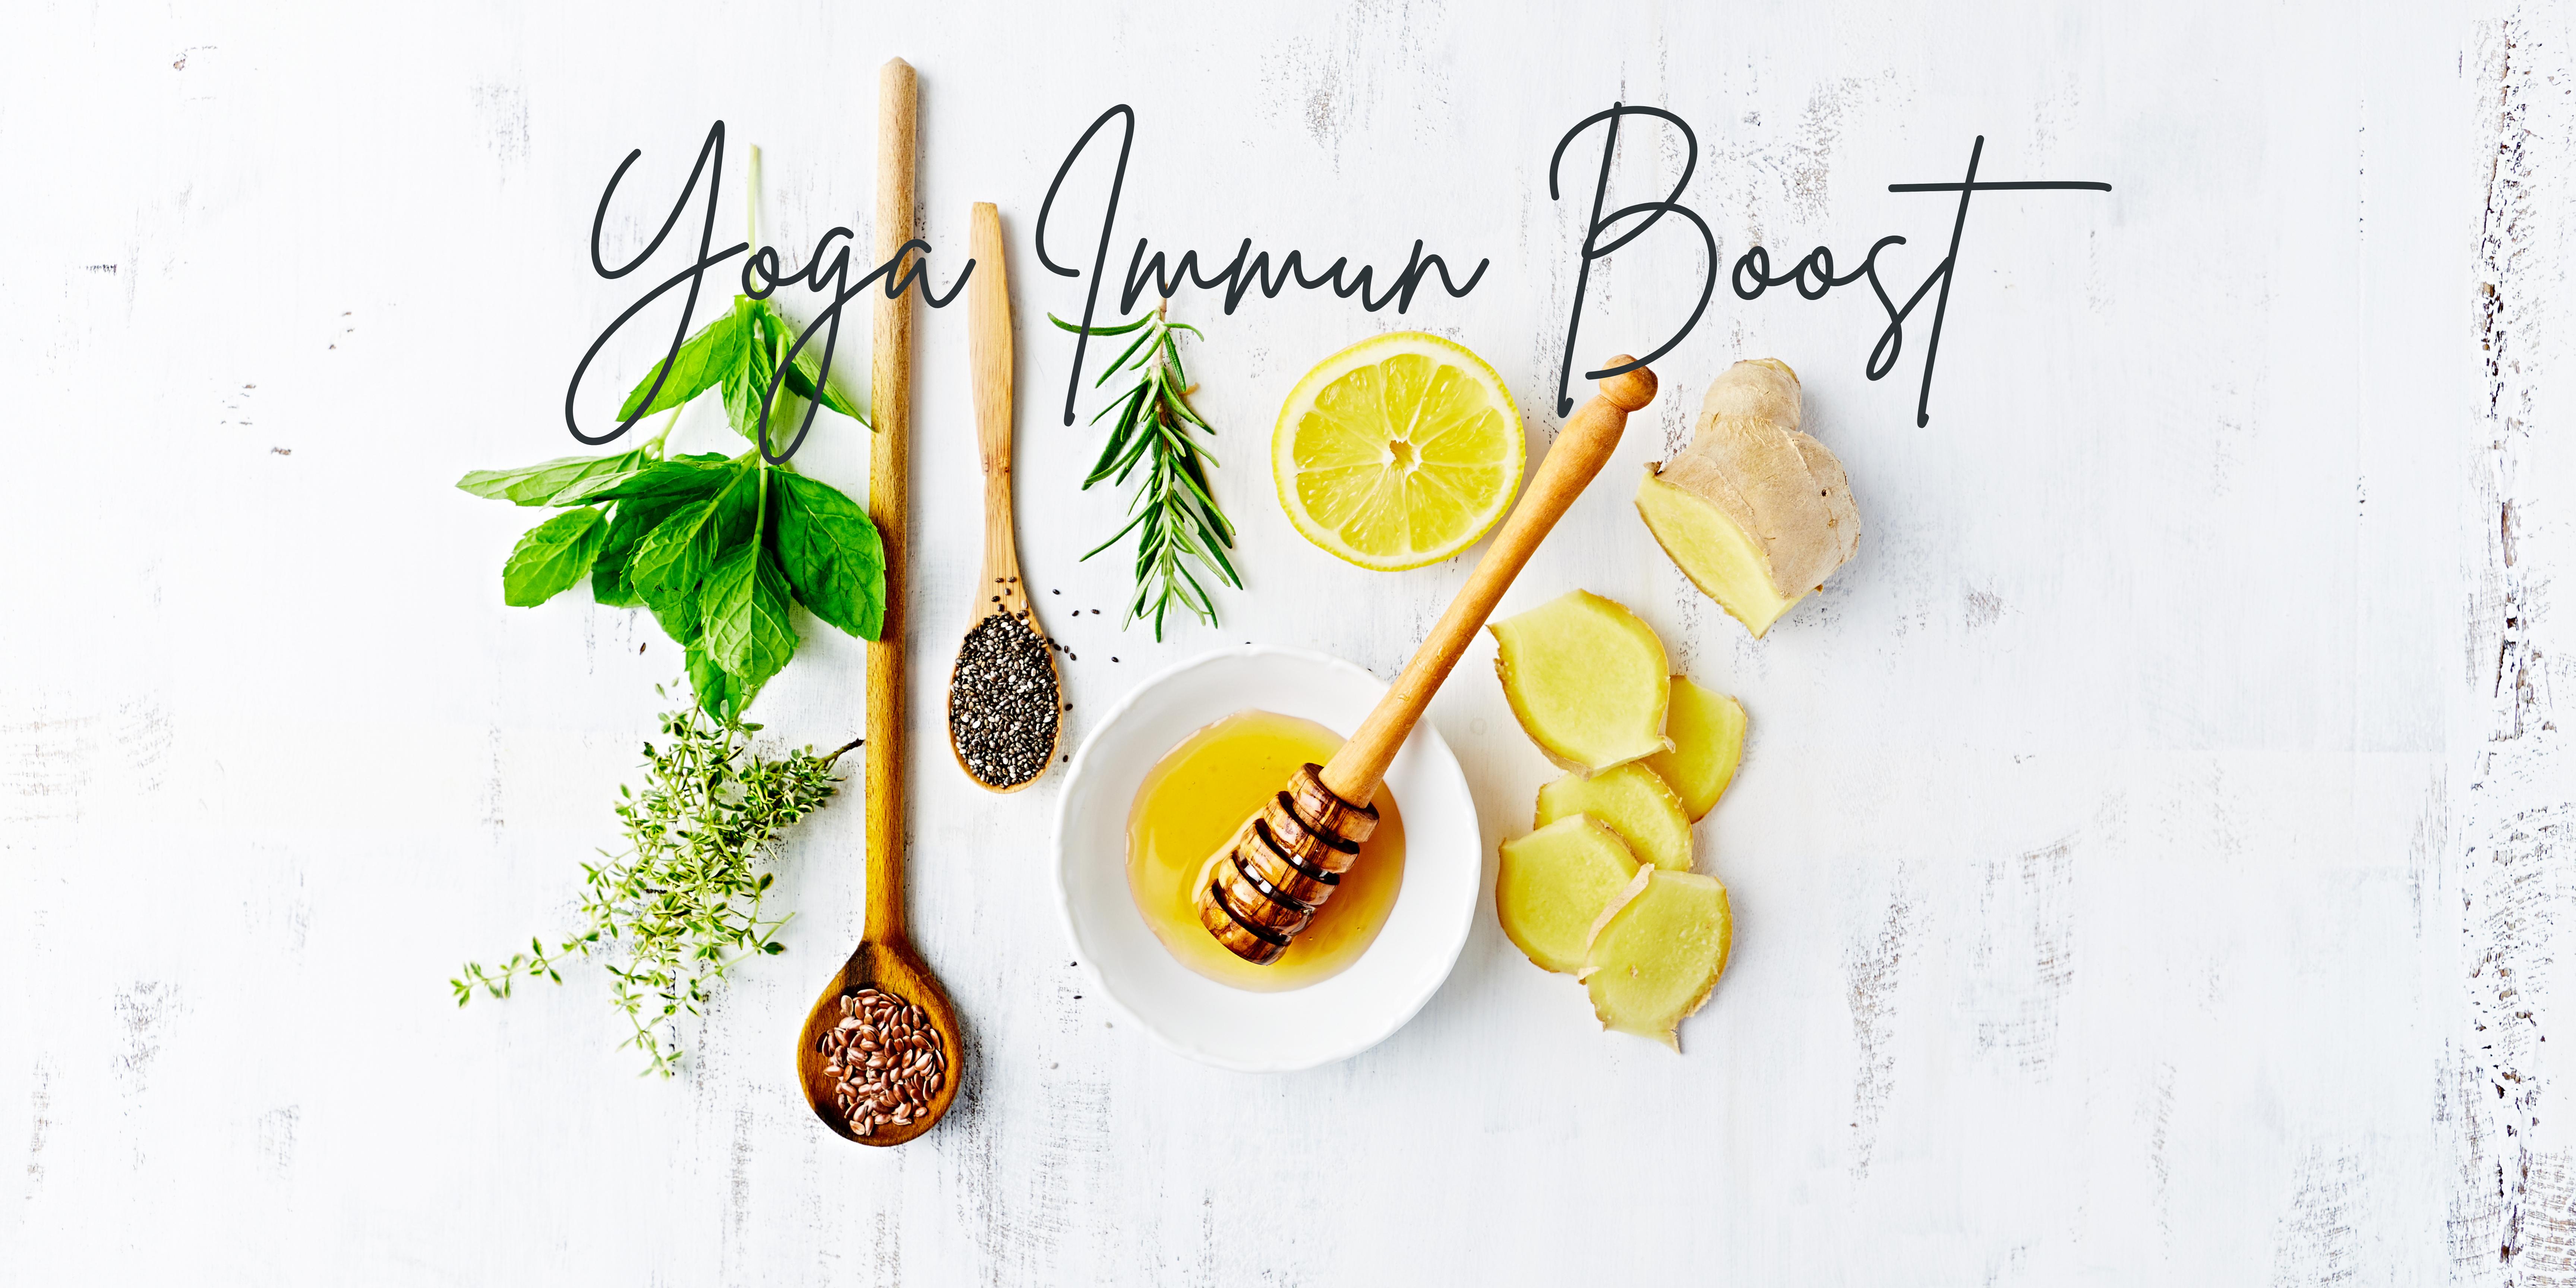 Yoga Immun Boost (2 timers yoga workshop + ebog)